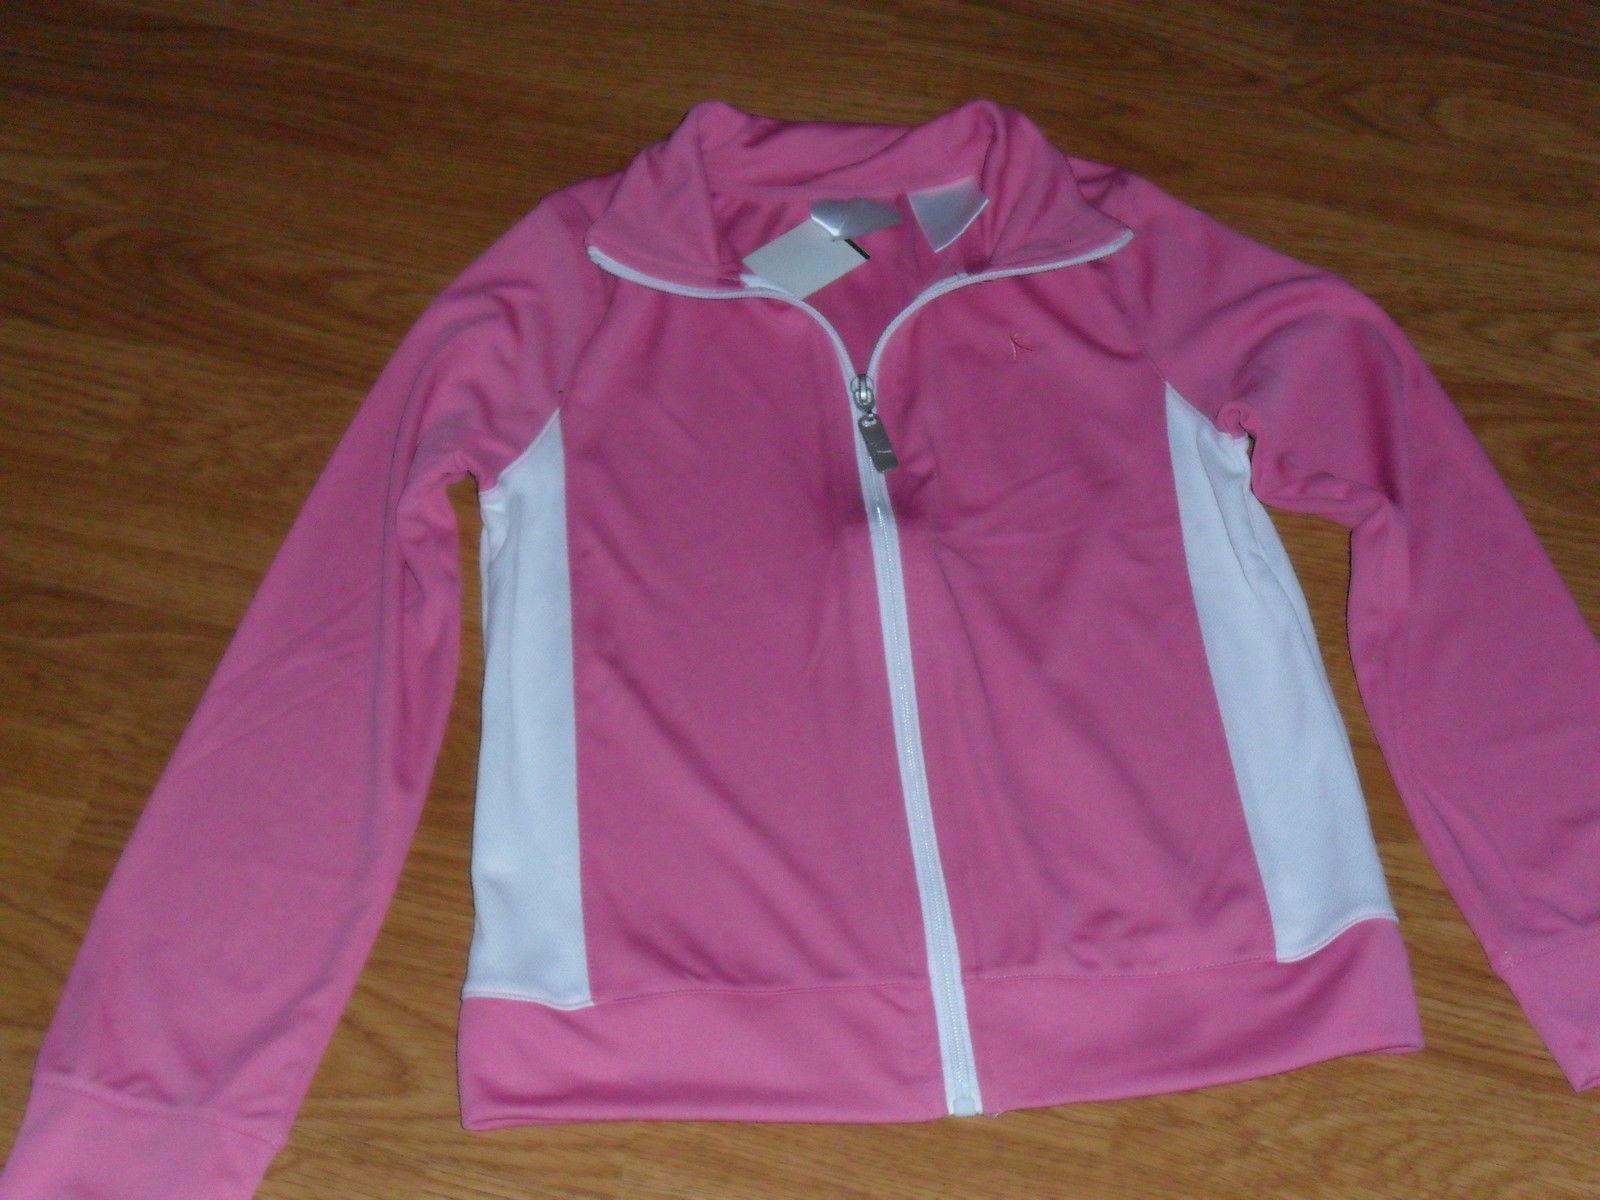 4353e0e73ad Girls Danskin Jacket Size L10 12 Lightweight and 29 similar items. t2ec16h  yse9sy0kzftbp8sq0 ie 60 57